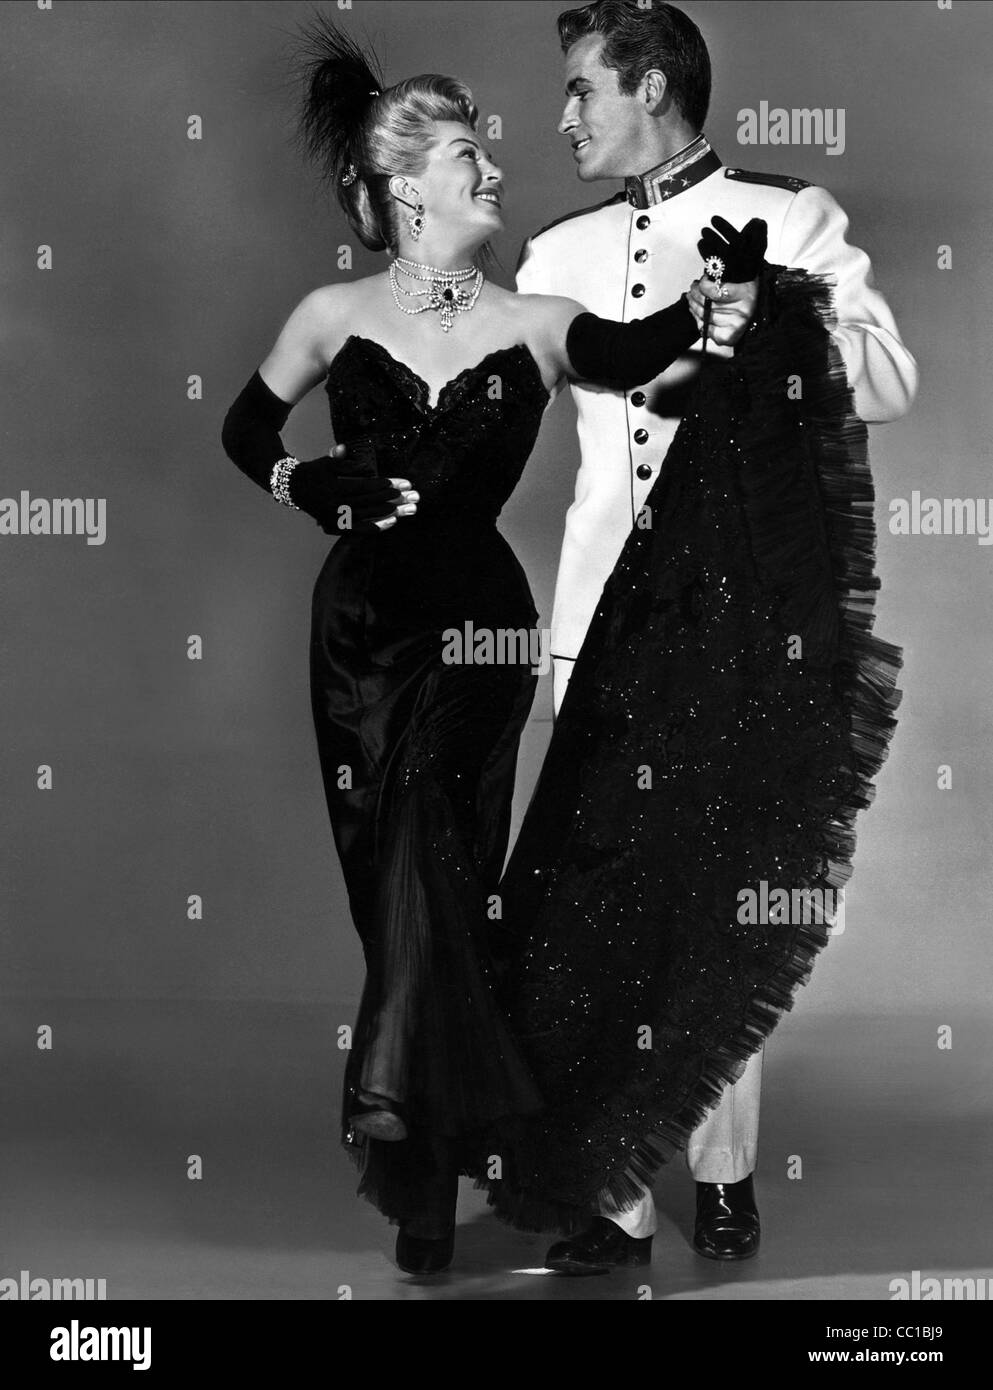 LANA TURNER FERNANDO LAMAS THE MERRY WIDOW 1952